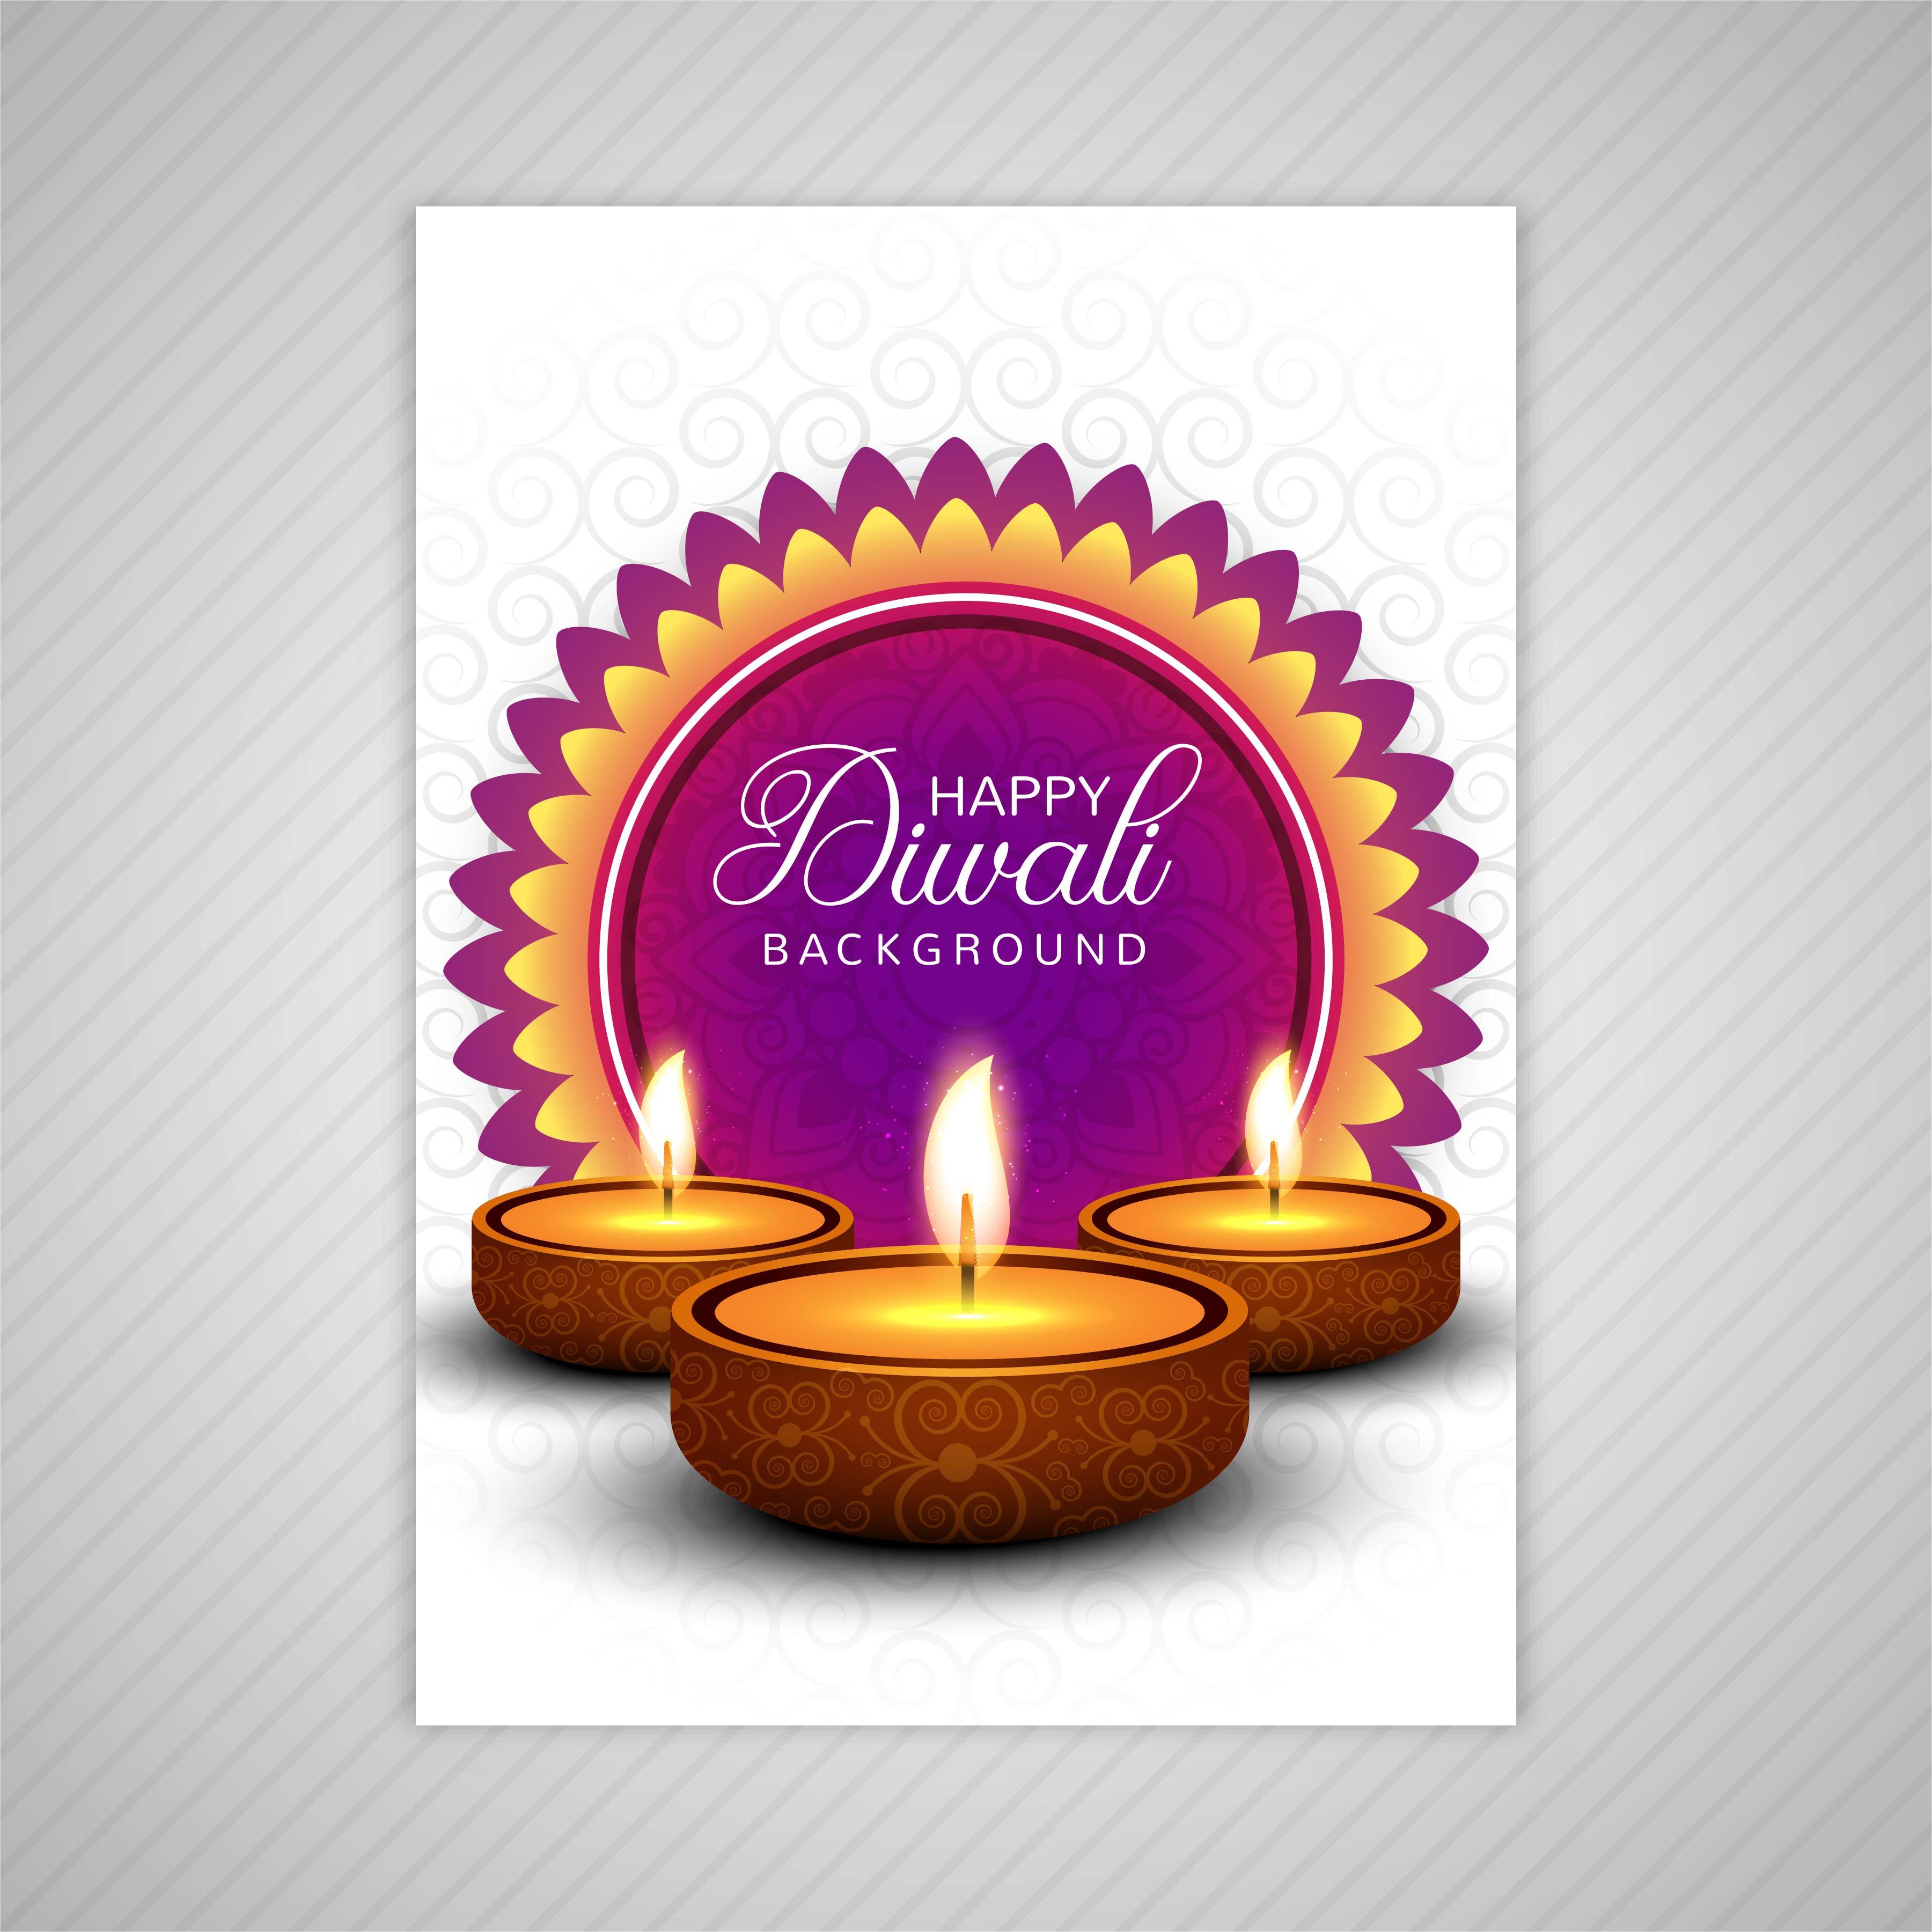 Decorative Diwali Greeting Card Template Design